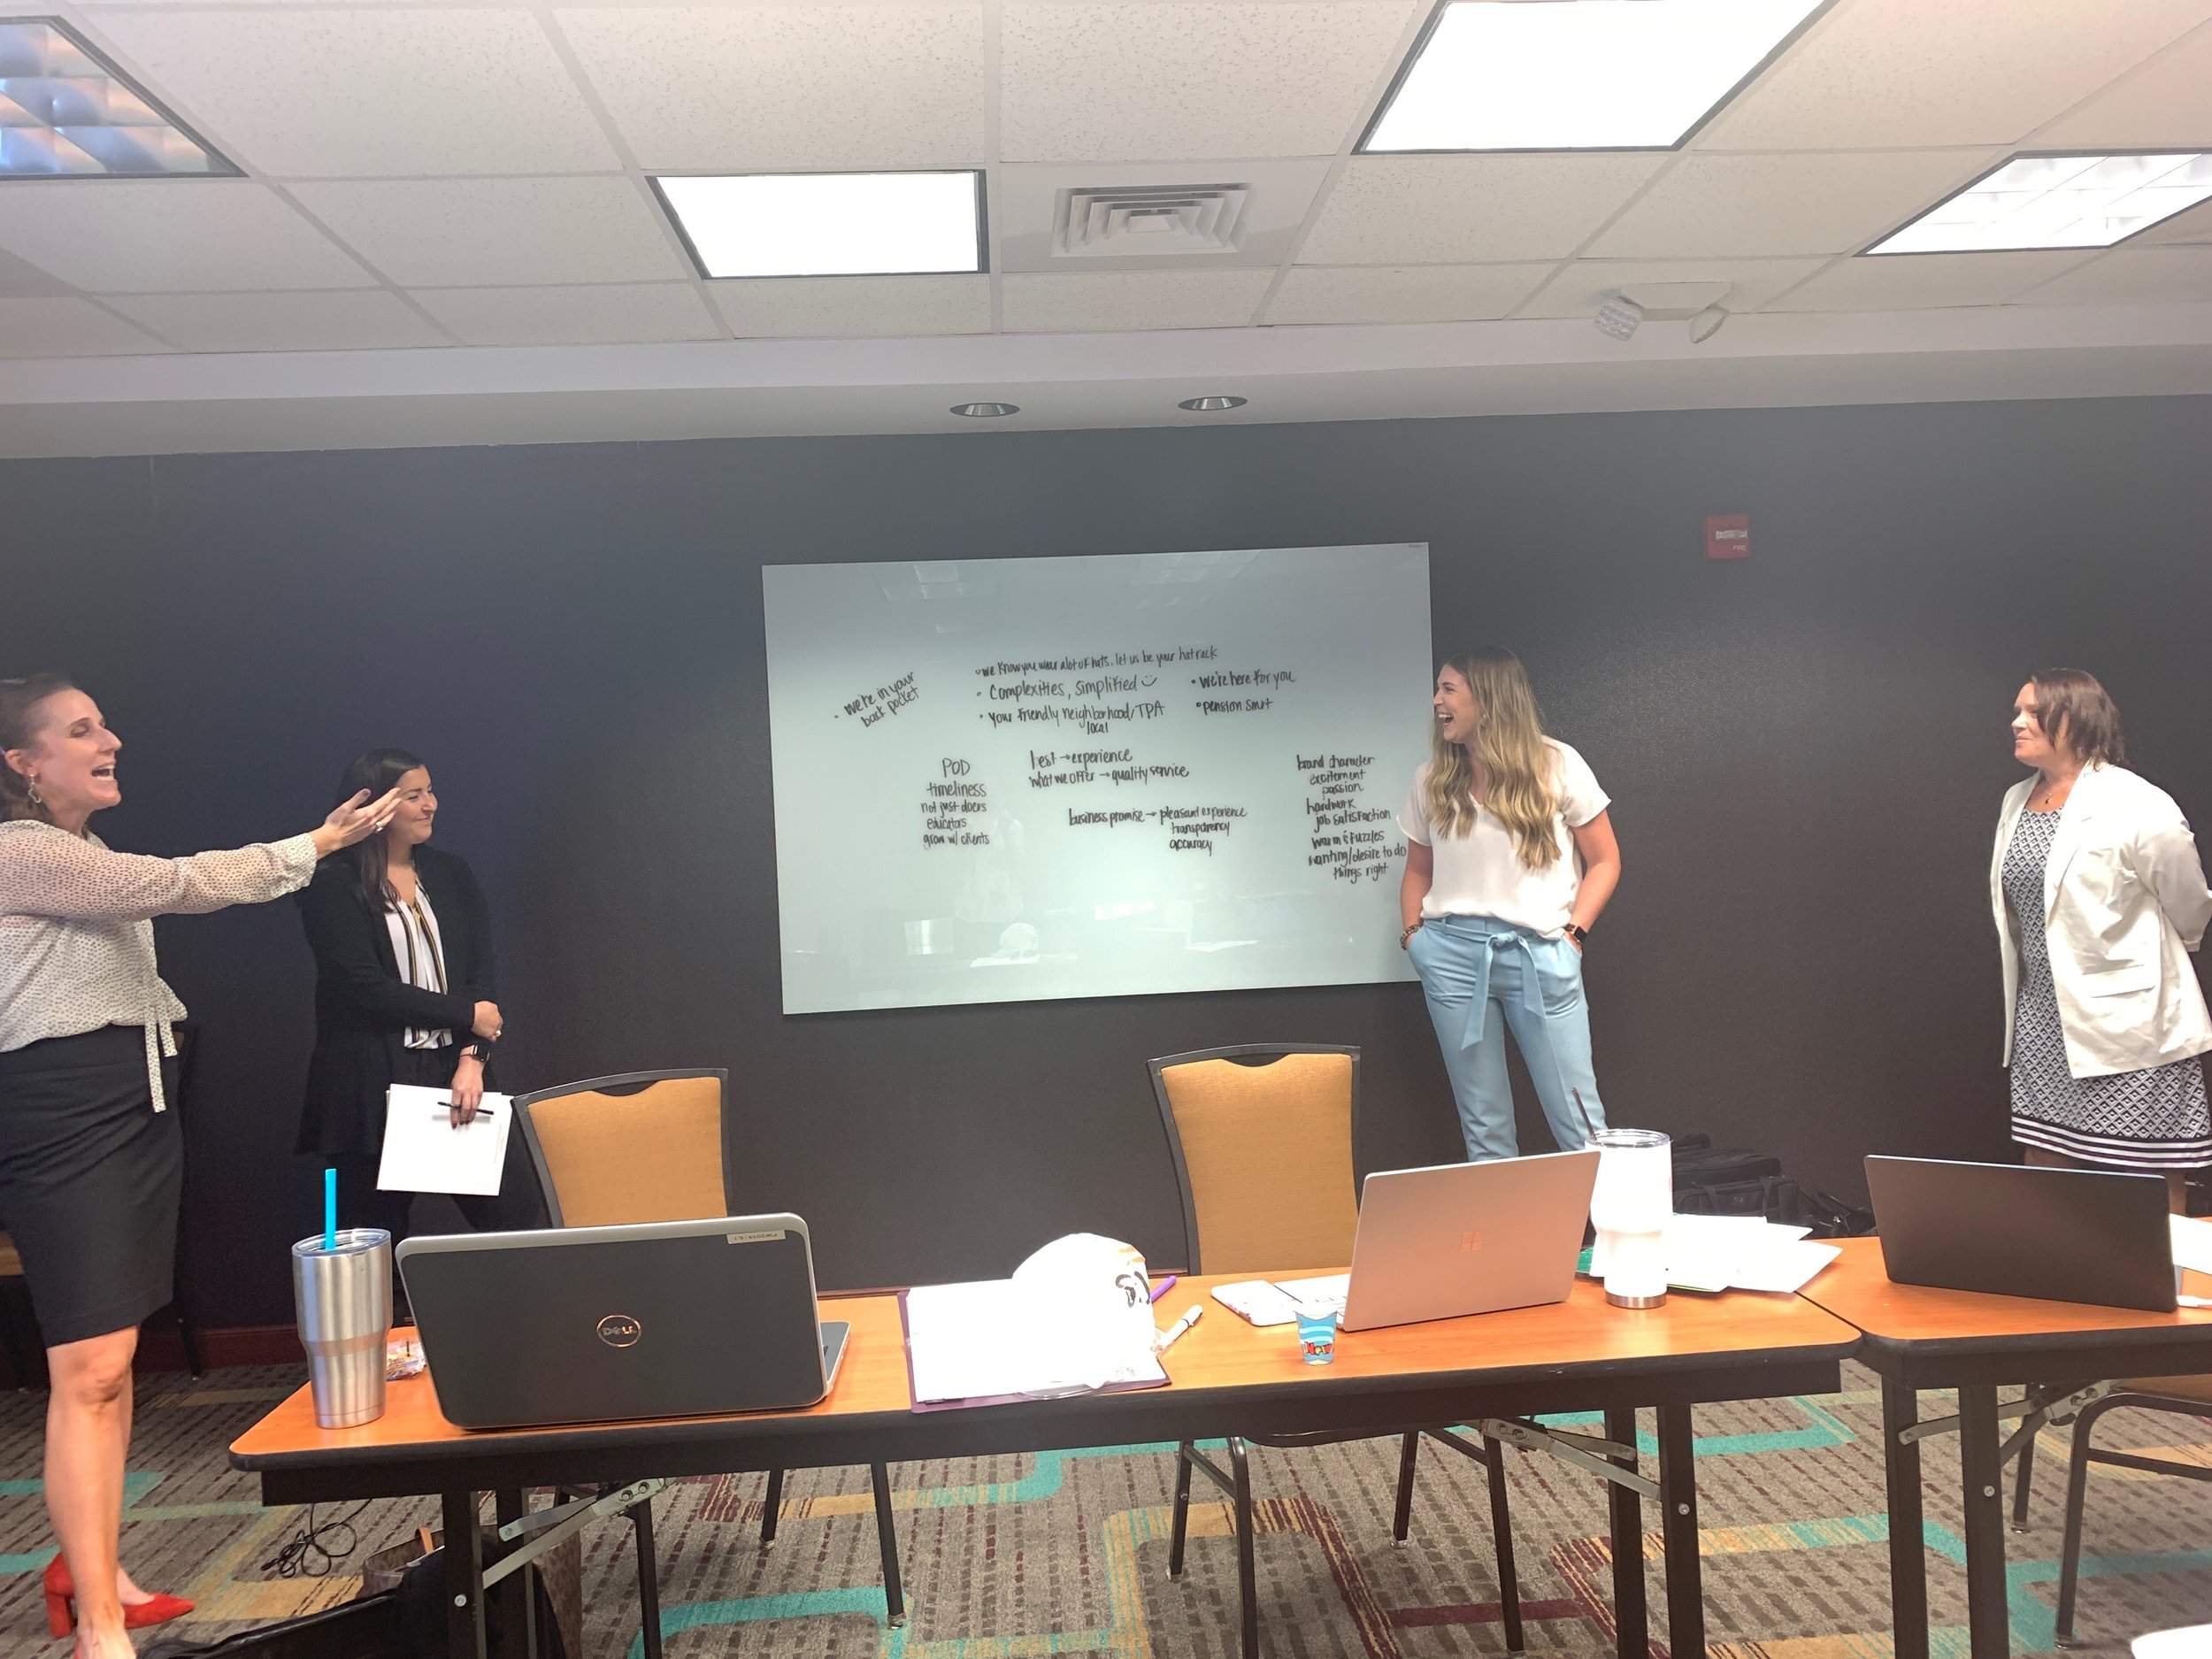 MTs group presenting IMG_3498.JPG